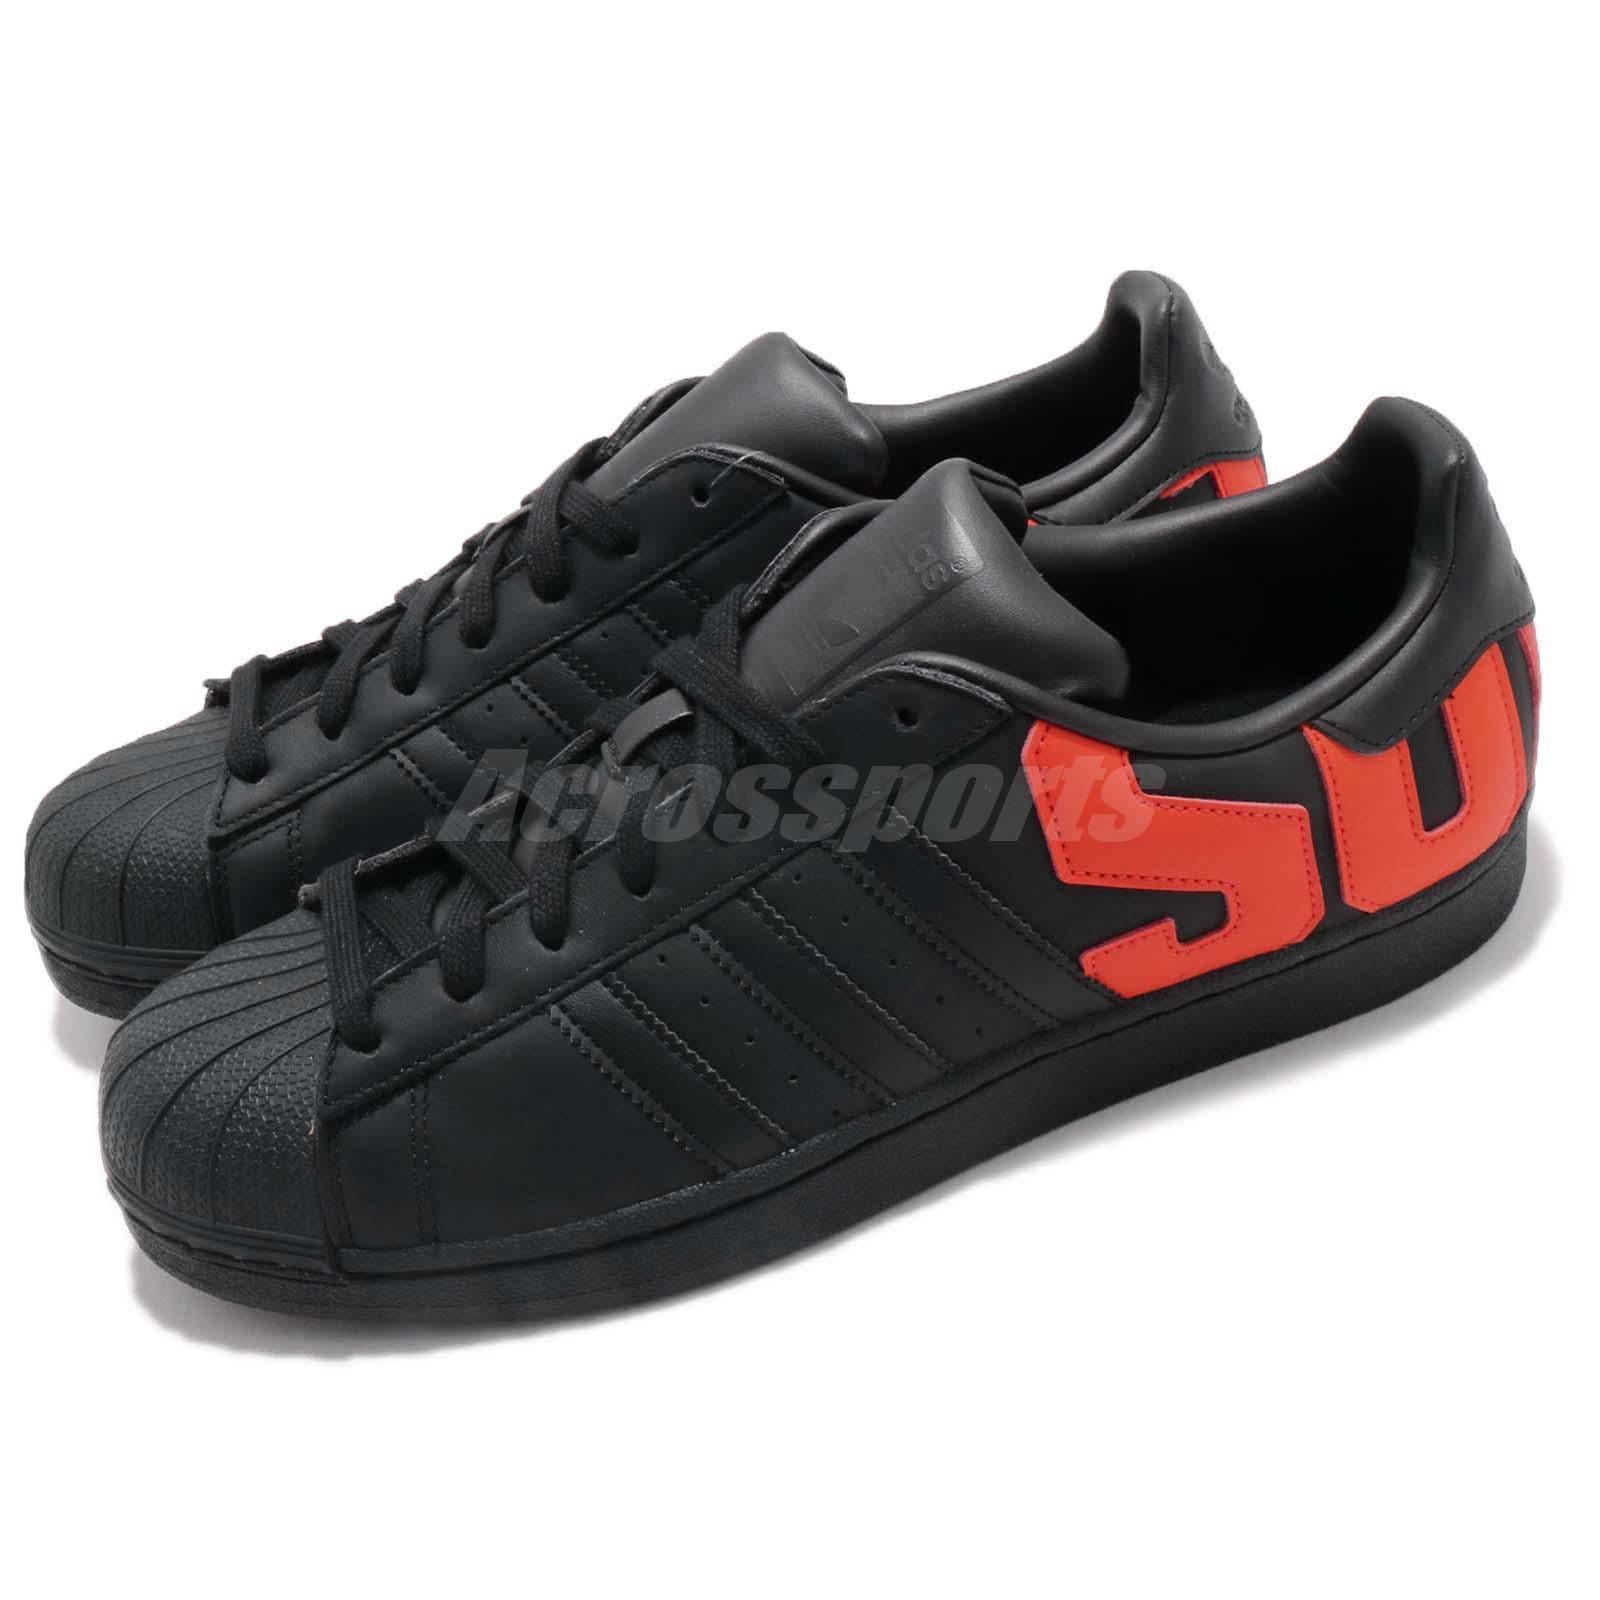 adidas superstar black and orange